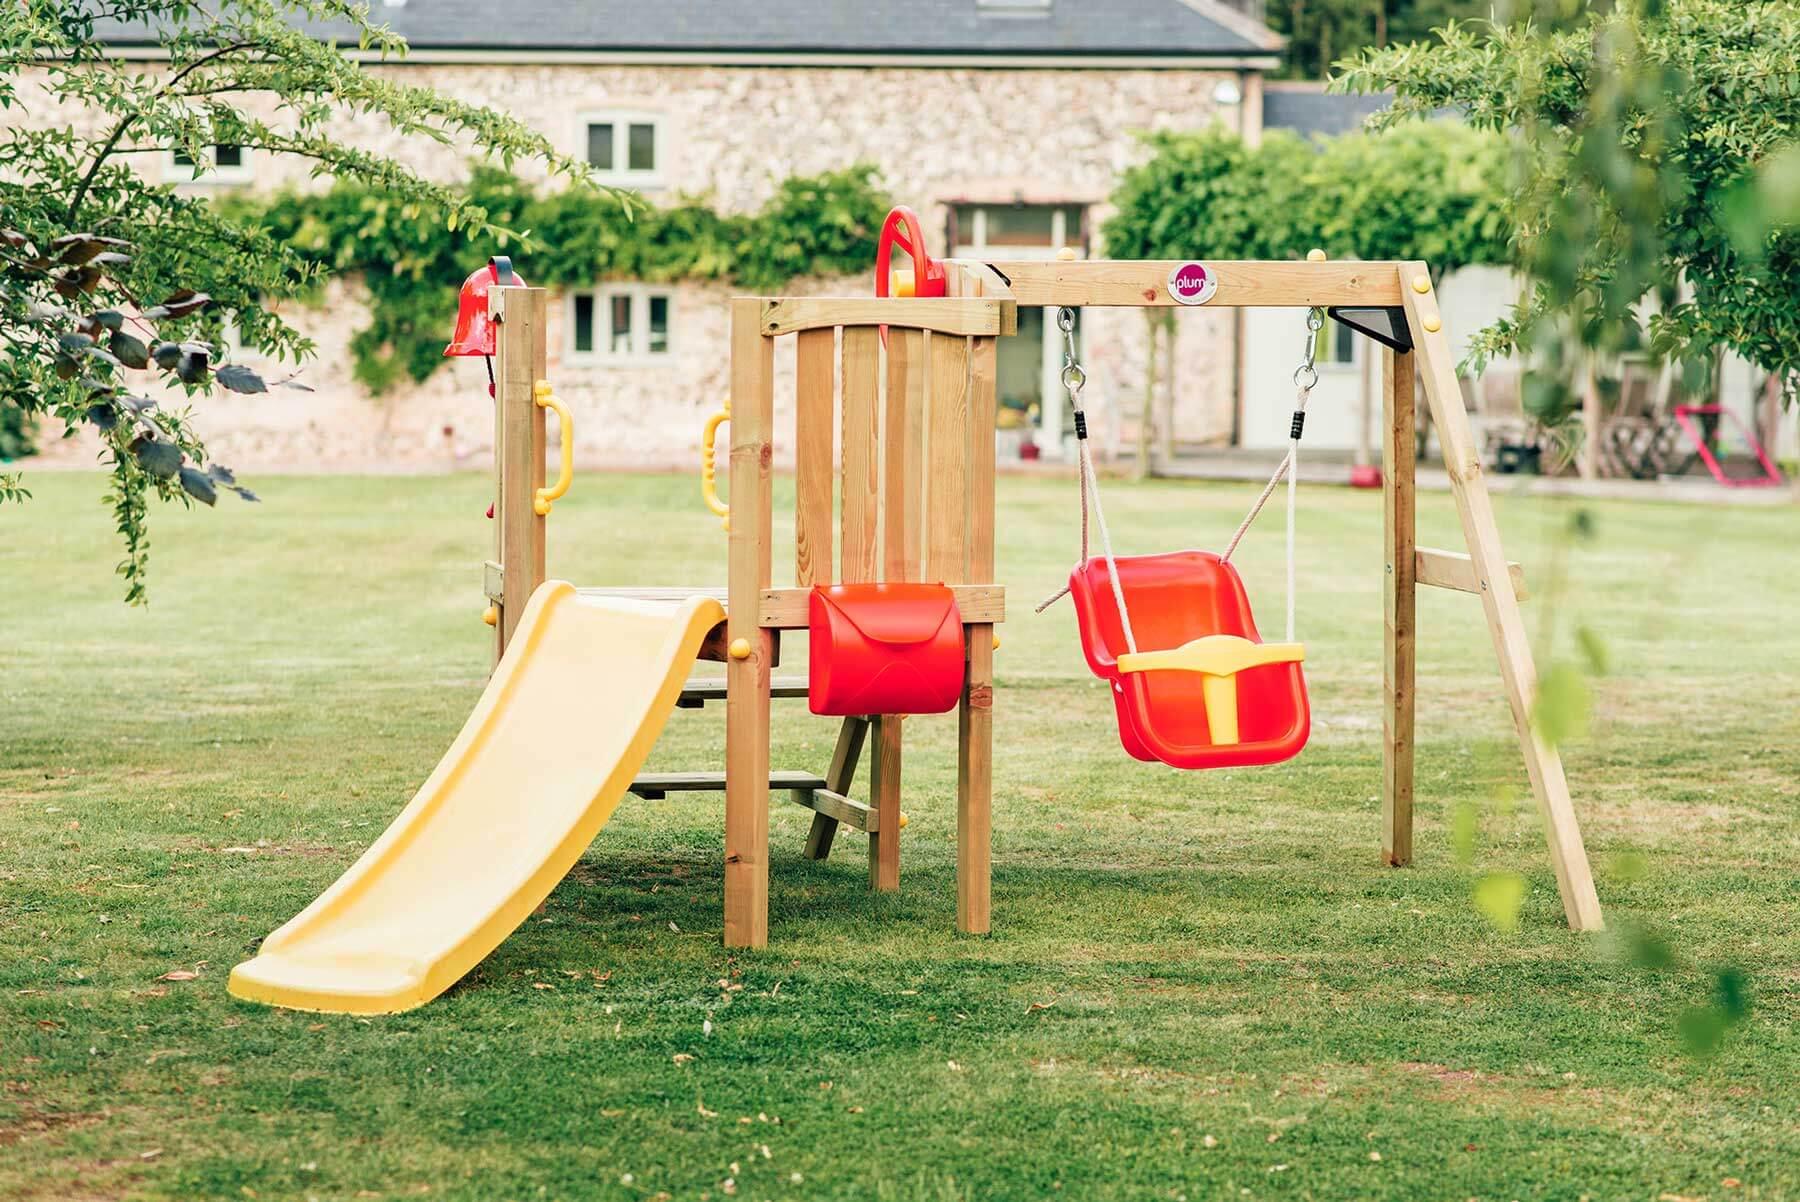 Full Size of Schaukel Garten Baby Holz Test Gartenpirat Kinder Erwachsene Ohne Betonieren Gartenliege Selber Bauen Gartenschaukel Metall Plum Kleinturm Mit Babyschaukel Garten Schaukel Garten